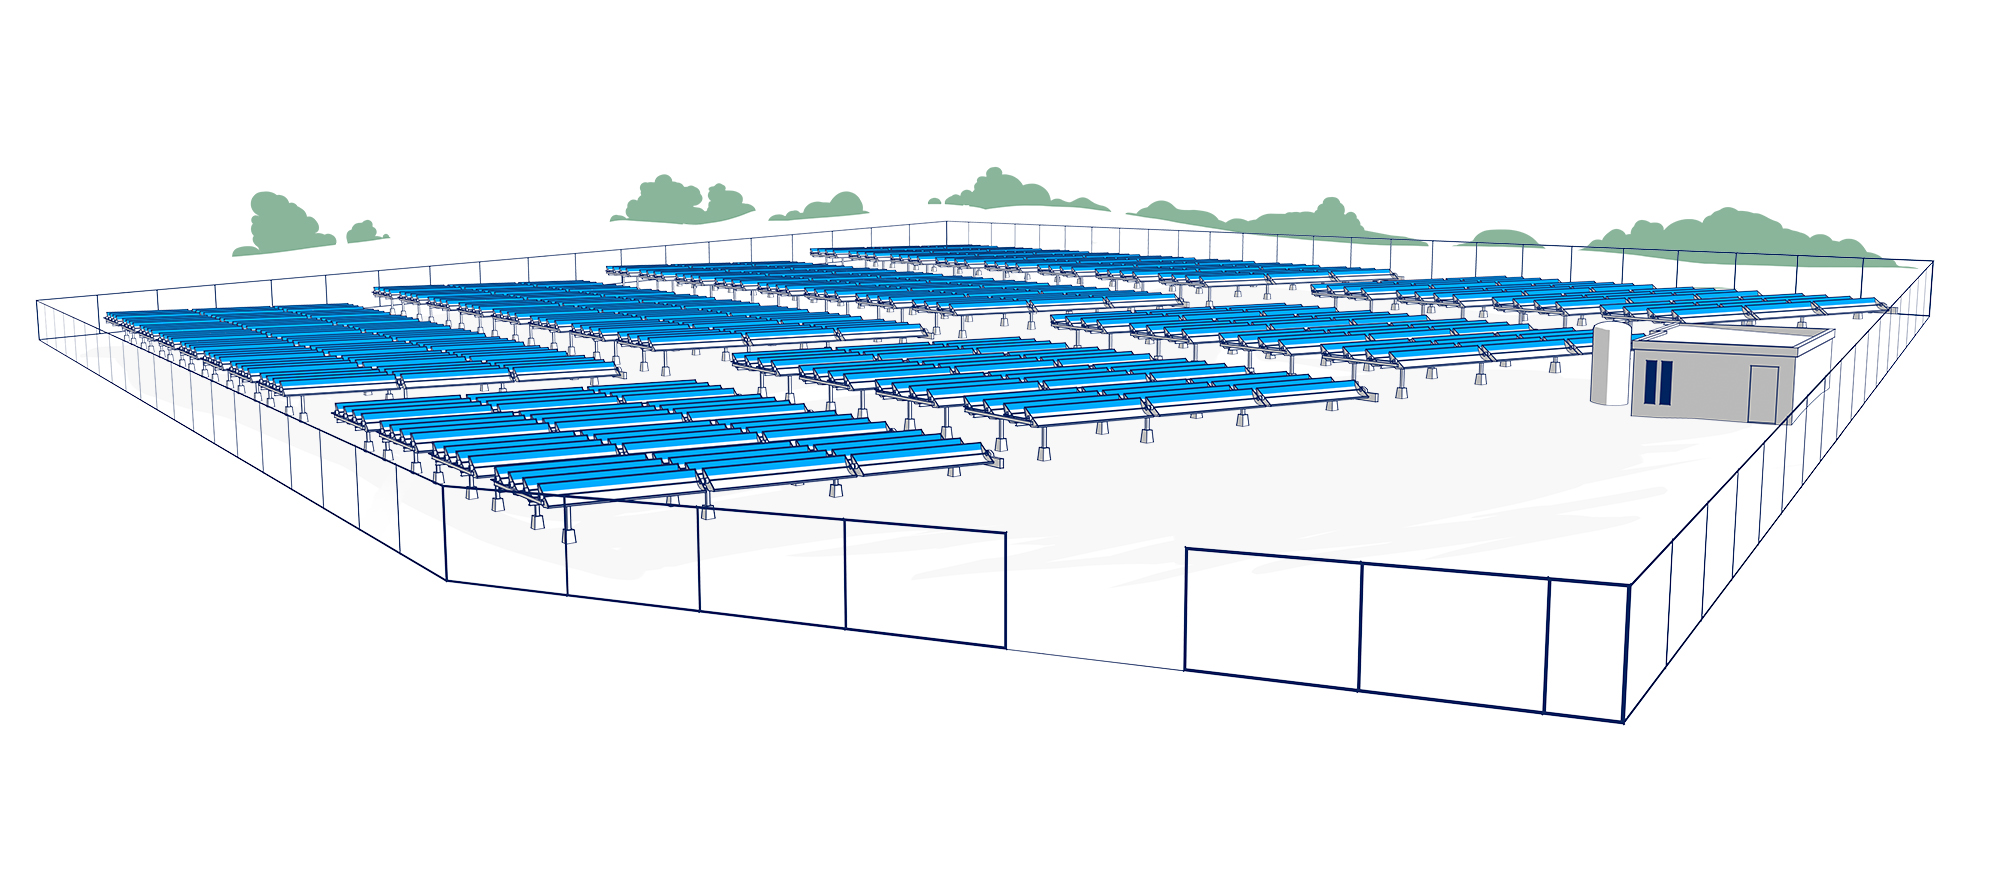 Parque solar térmico para calefacción urbana